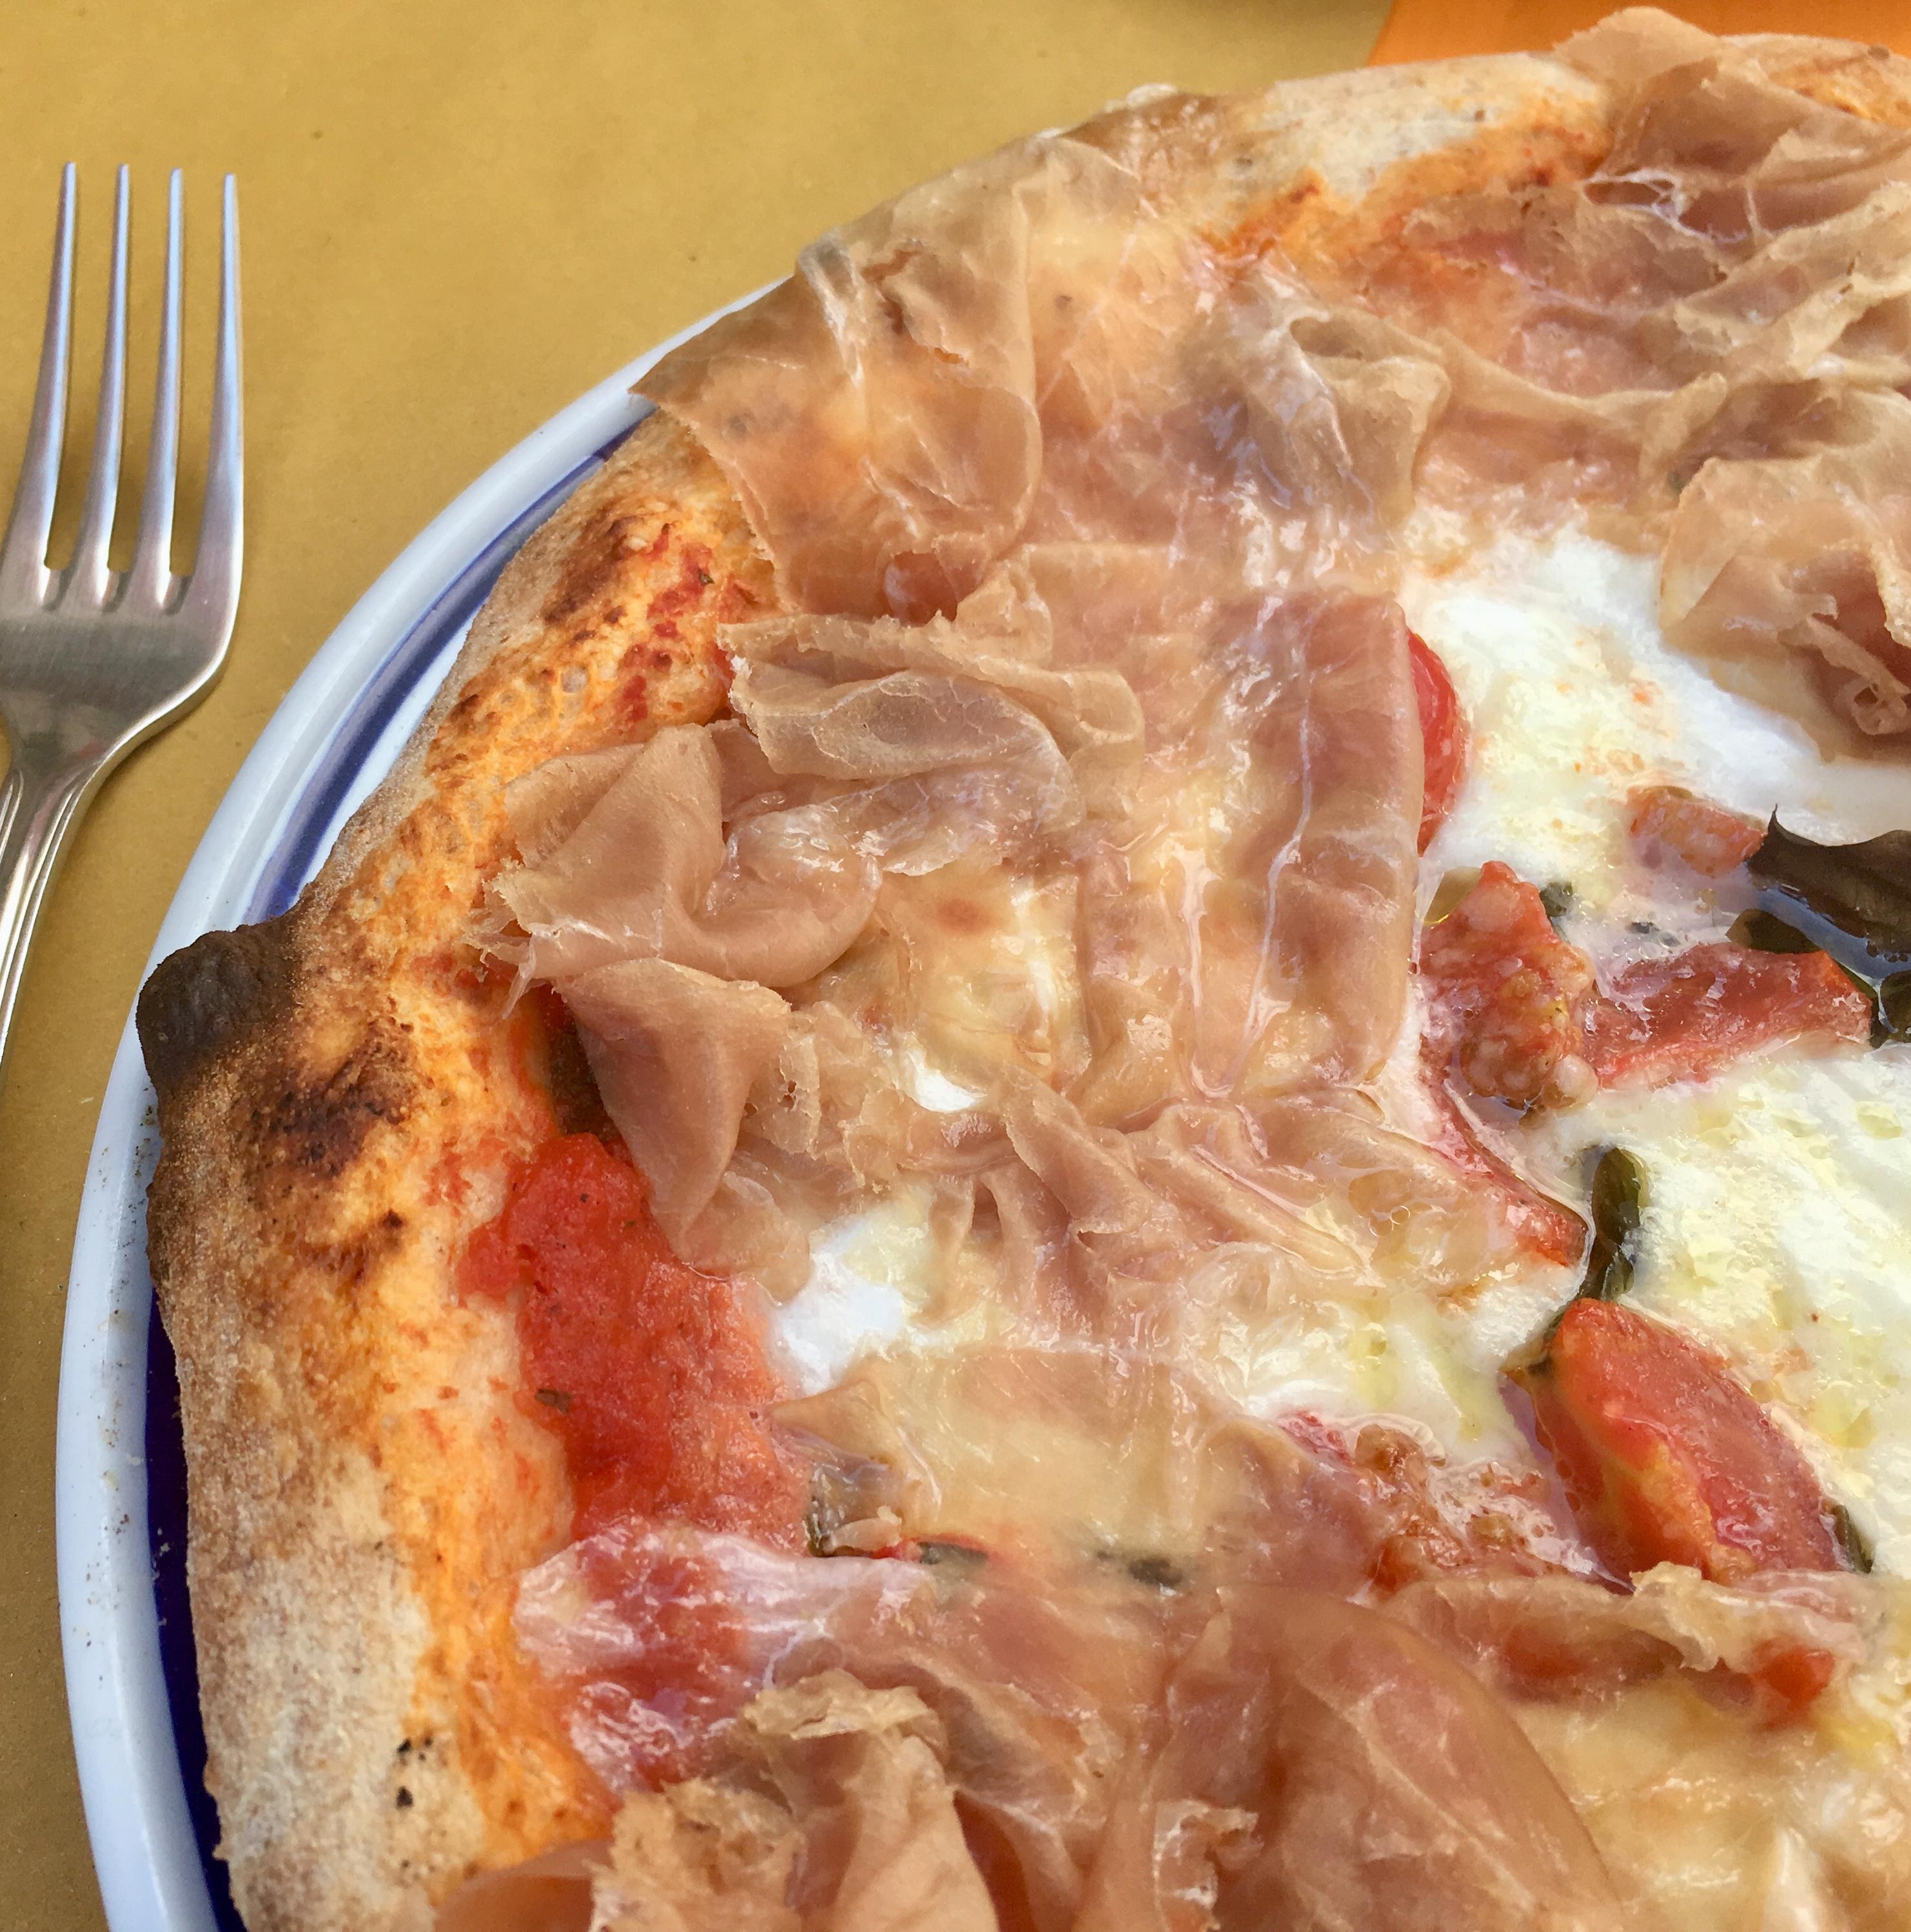 Italian pizza dough: cooking secrets. Unleavened Pizza Base 37